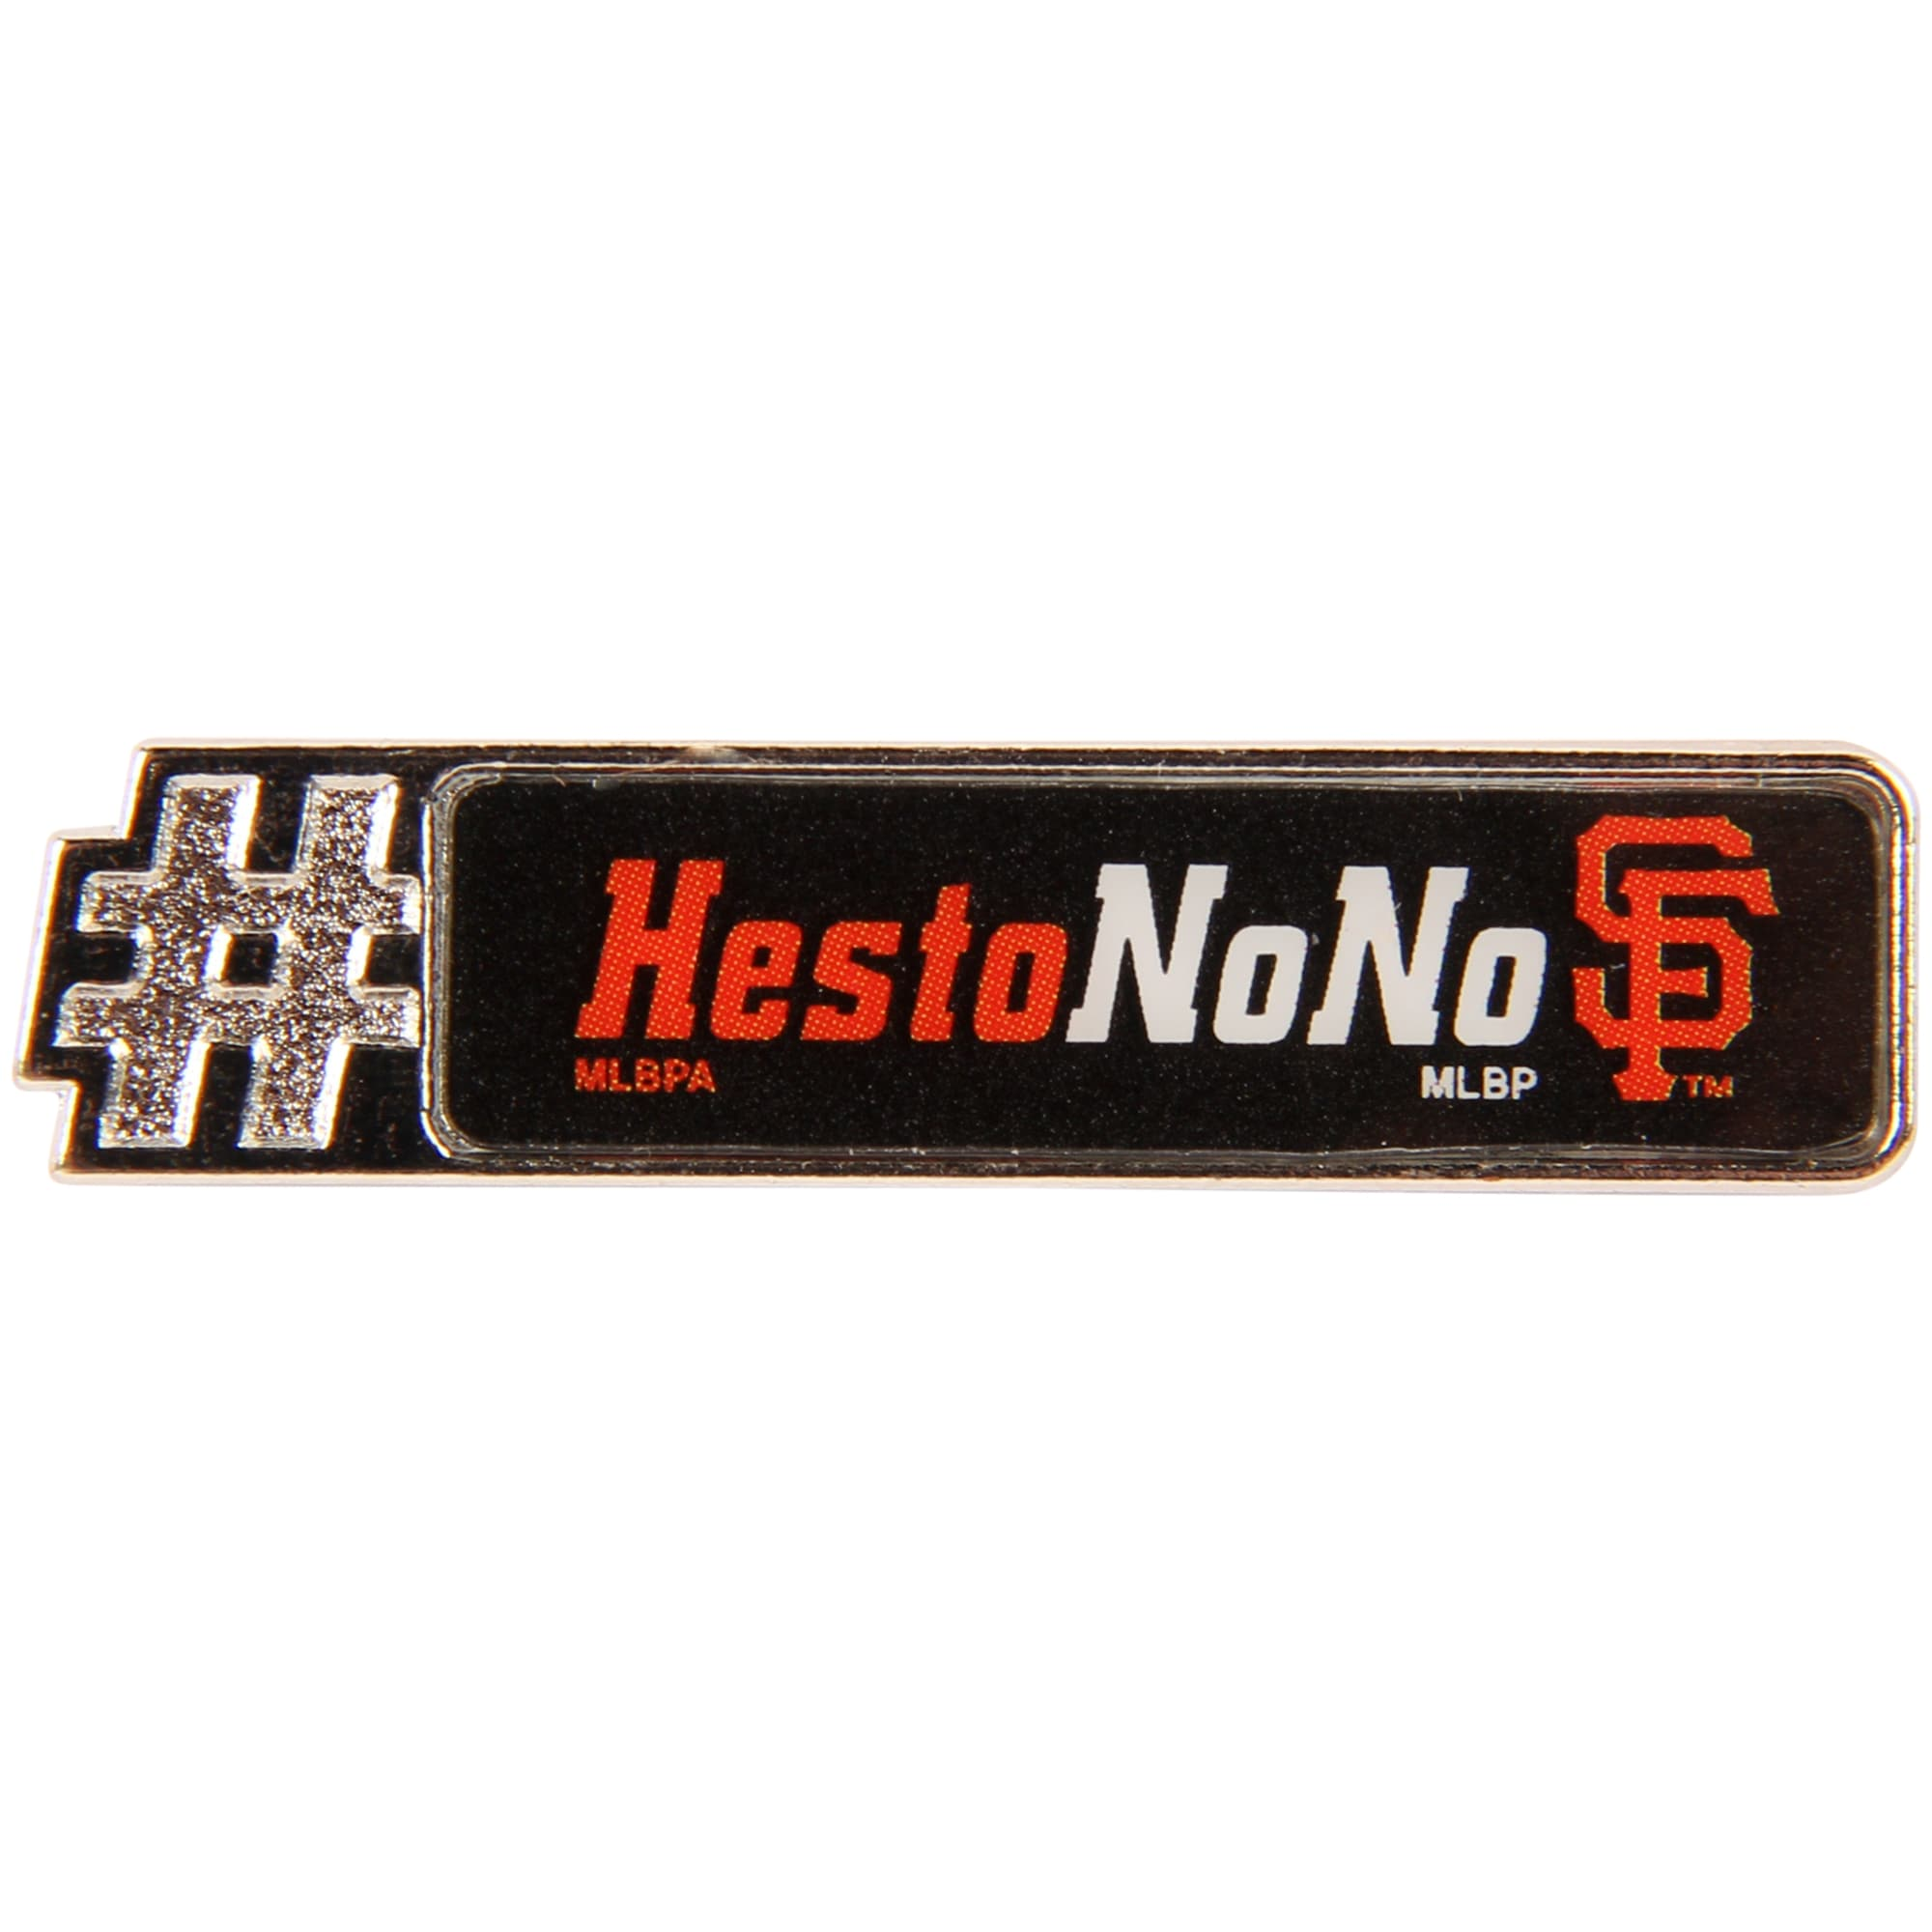 Chris Heston San Francisco Giants WinCraft Player Pin